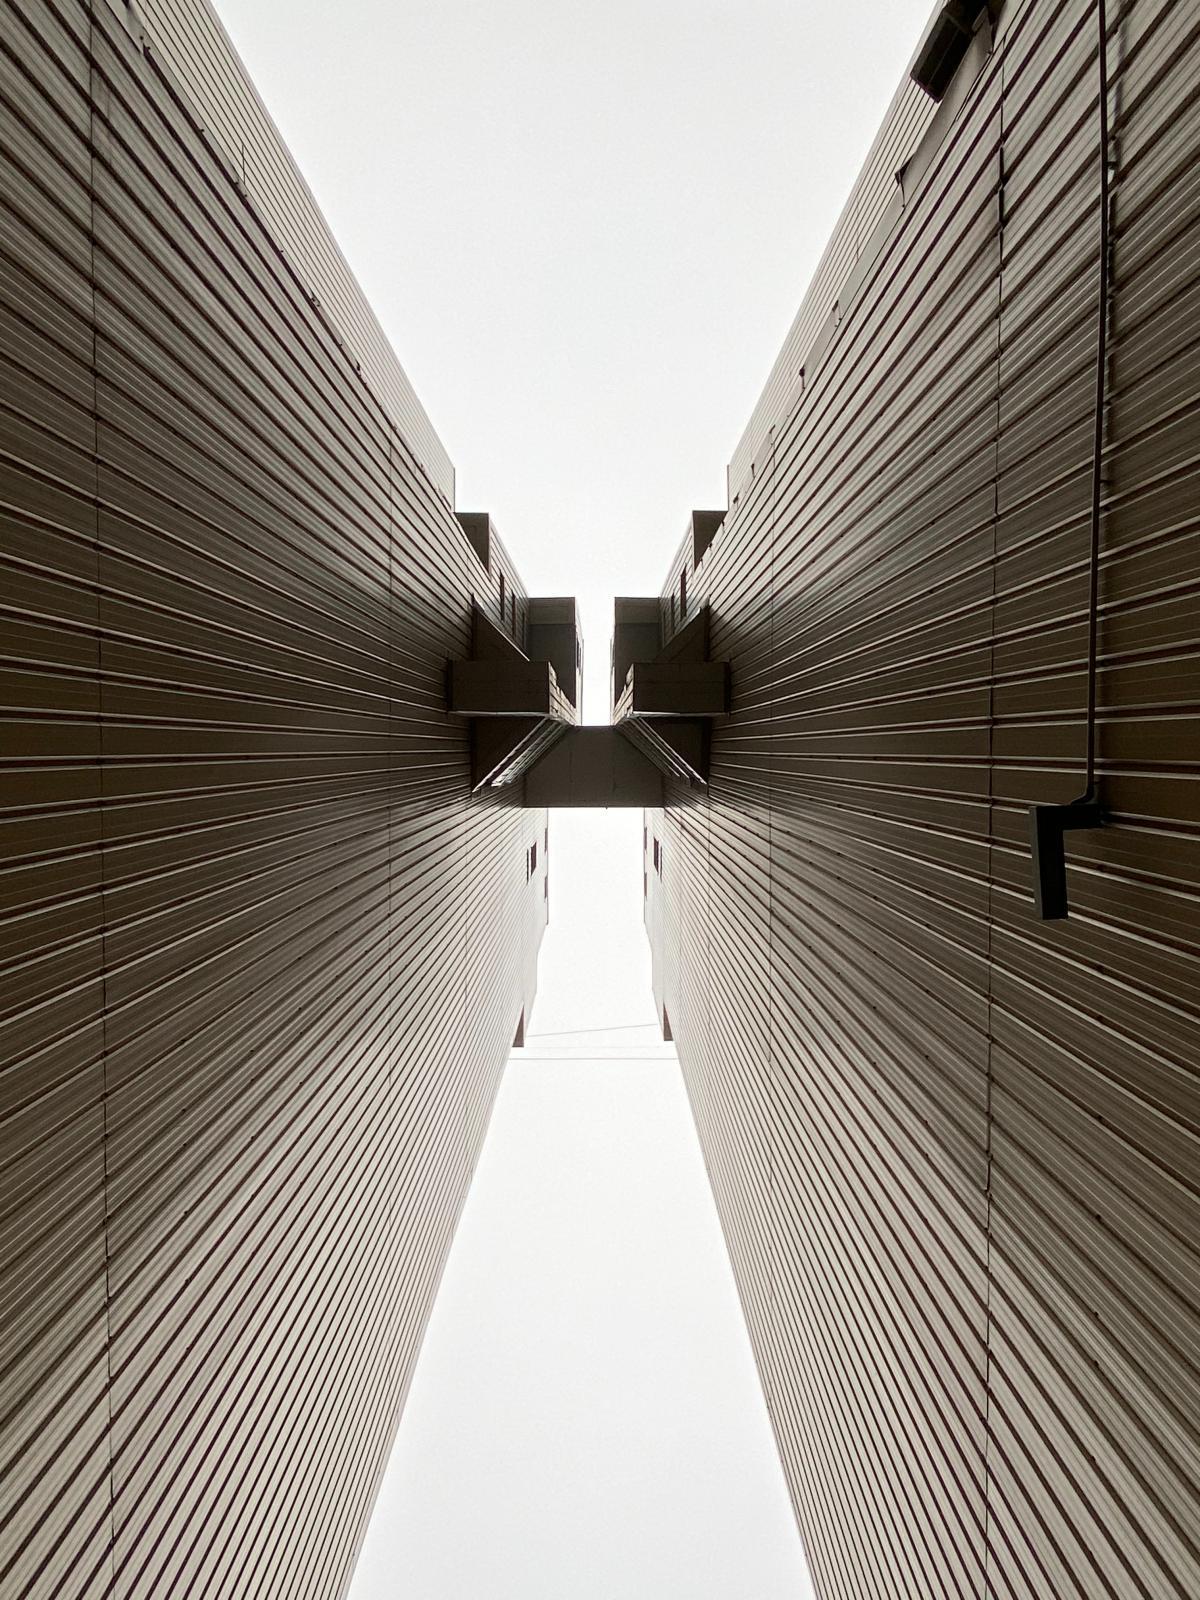 Symmetry Graphic Digital #425387